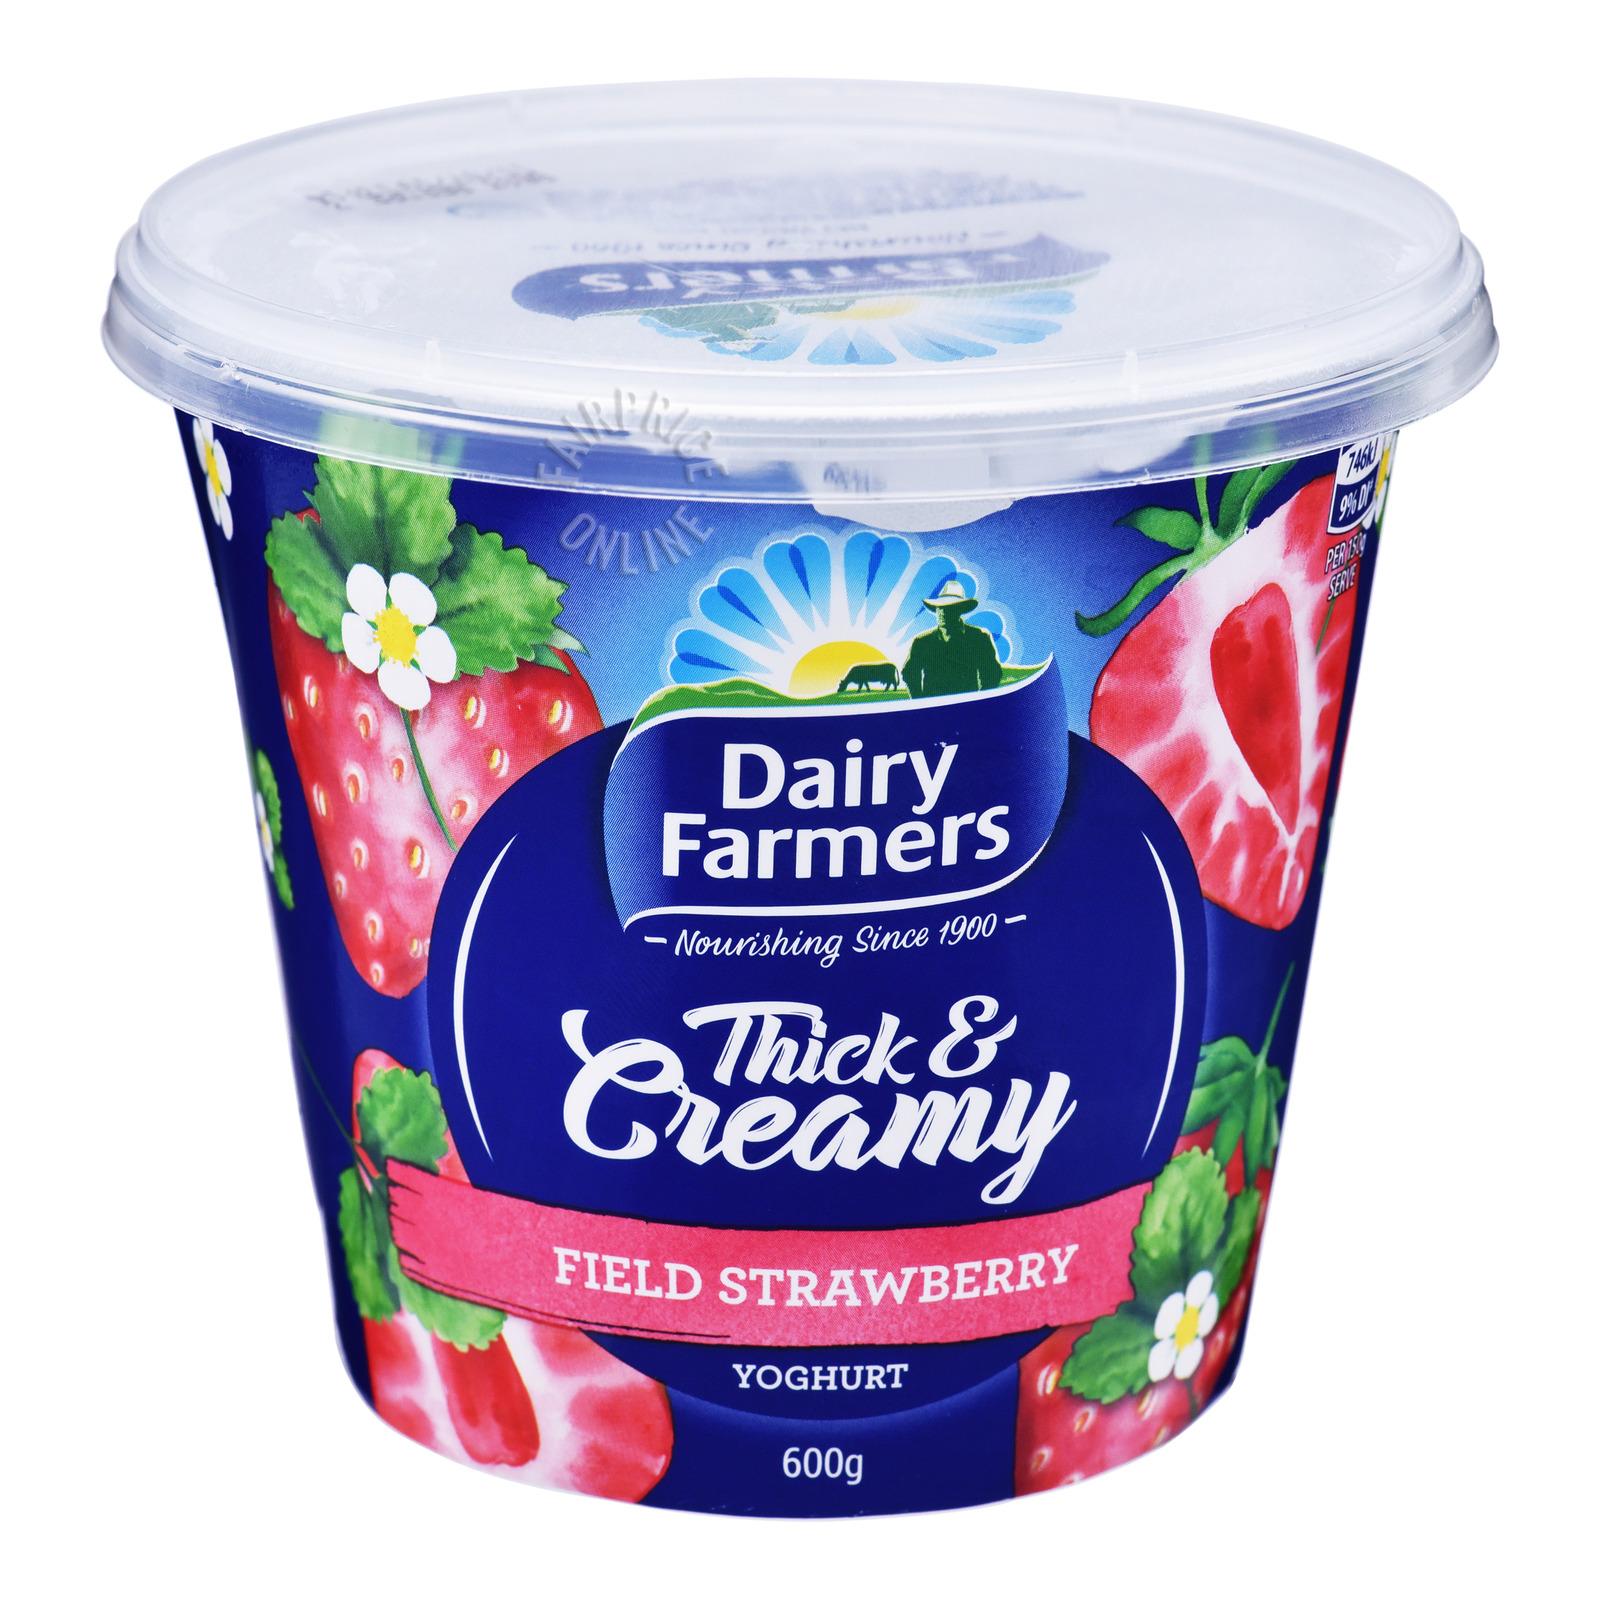 Dairy Farmers Thick & Creamy Yoghurt - Field Strawberries